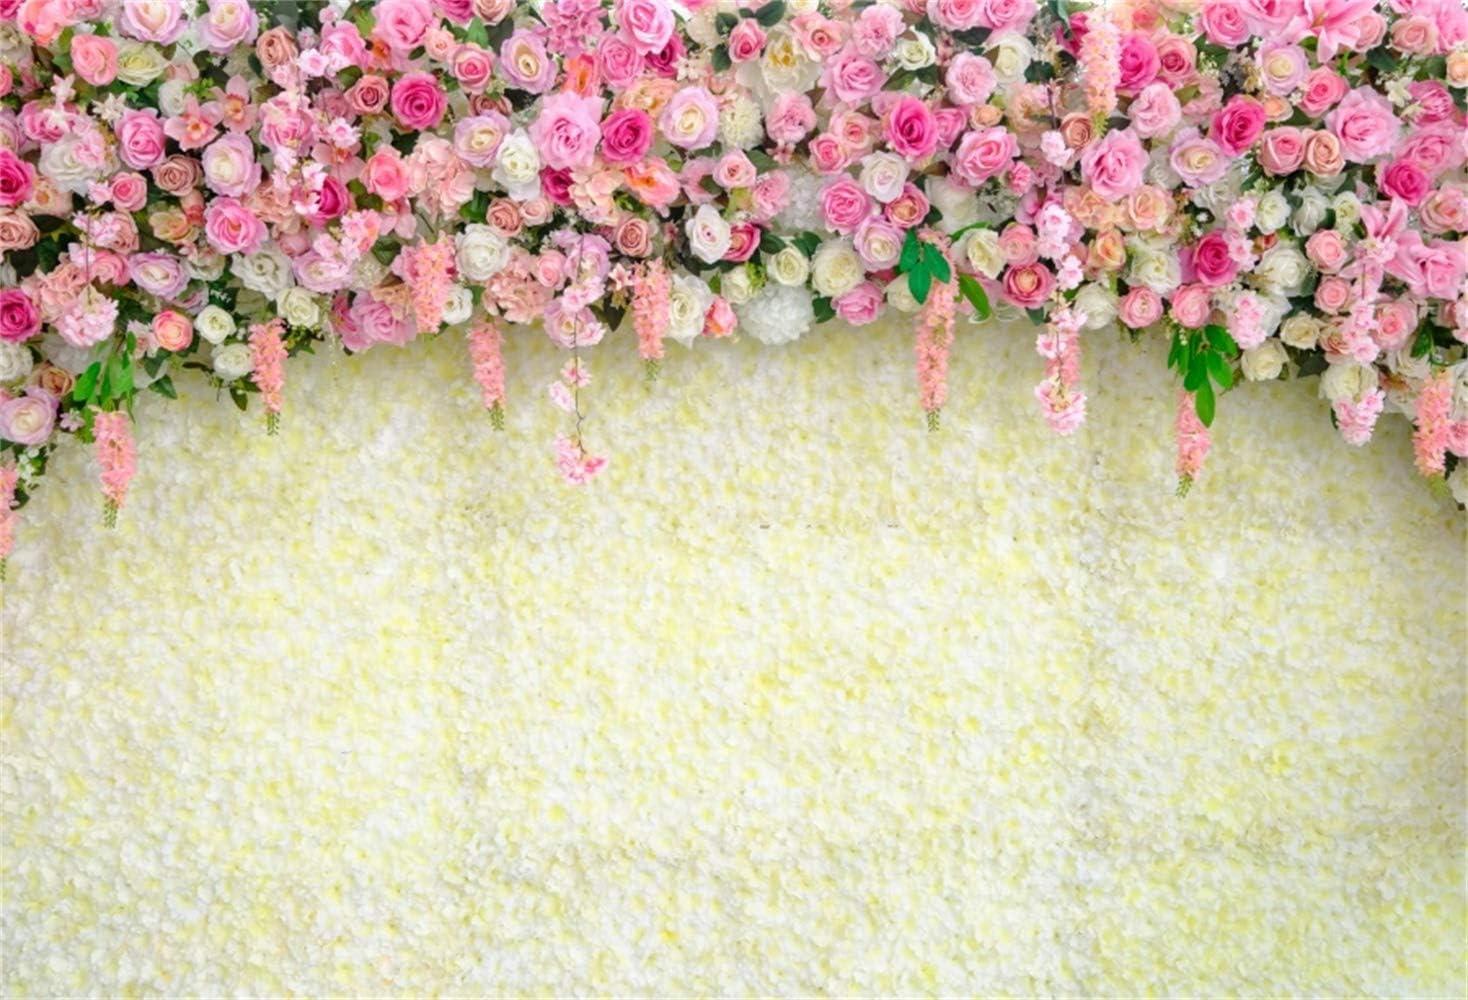 Paper Flower Backdrop for Photography Polyester 8x6.5ft White Green Flowers Wall Bridal Shower Birthday Party Banner Studio Newborn Kids Children Portrait Shoot Wallpaper